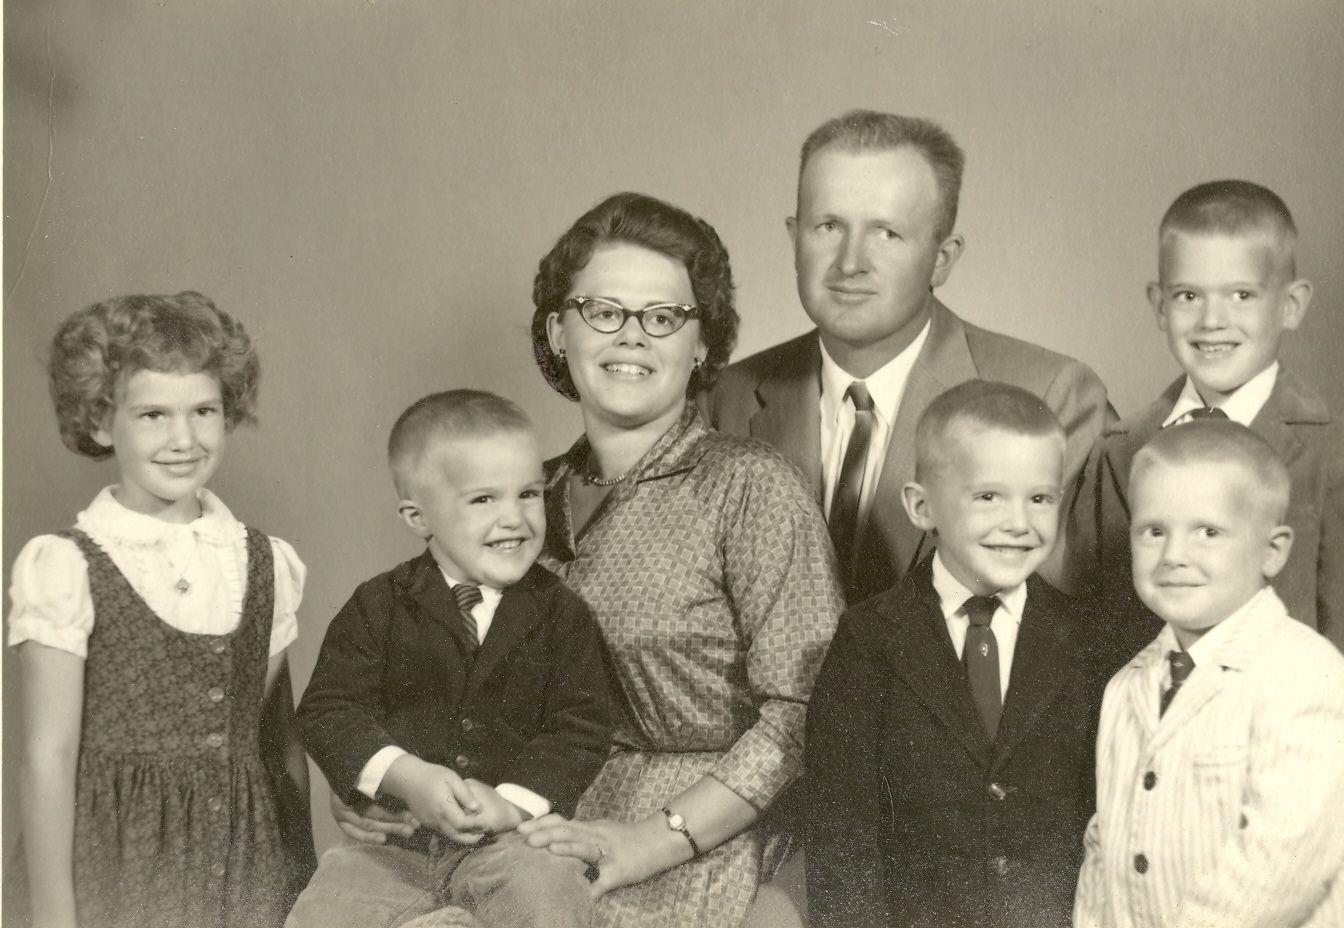 James Fowler Family 1960s Snapshots Photo Vintage Photos